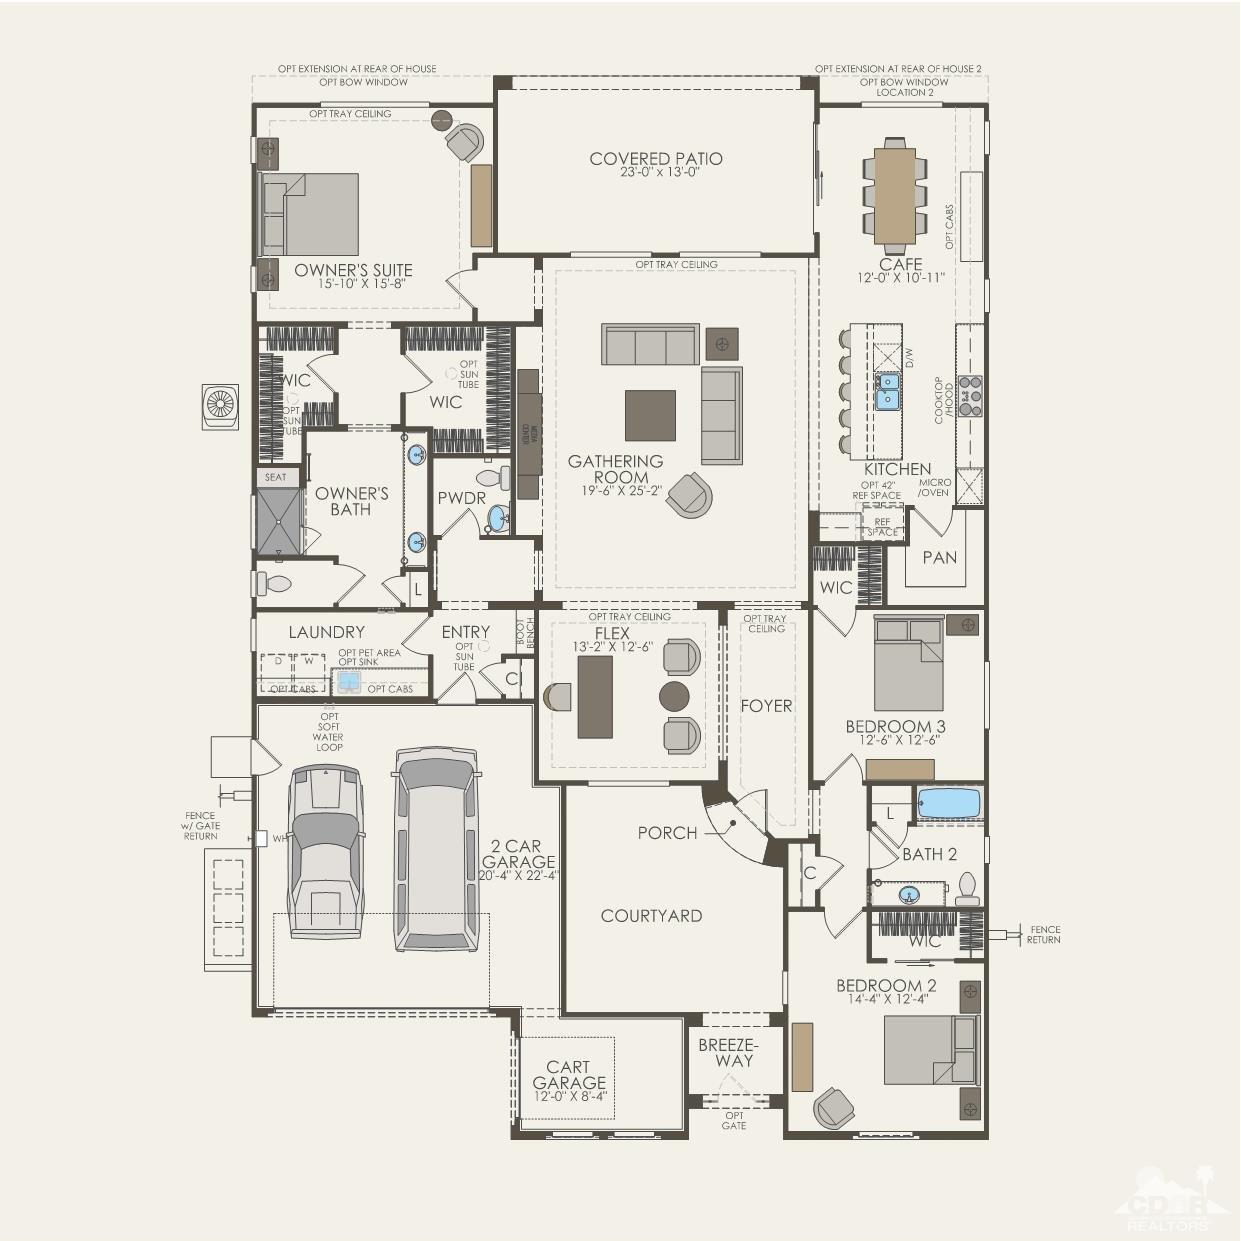 78 Bordeaux, Rancho Mirage, California 92270, 2 Bedrooms Bedrooms, ,3 BathroomsBathrooms,Residential,For Sale,78 Bordeaux,219022609